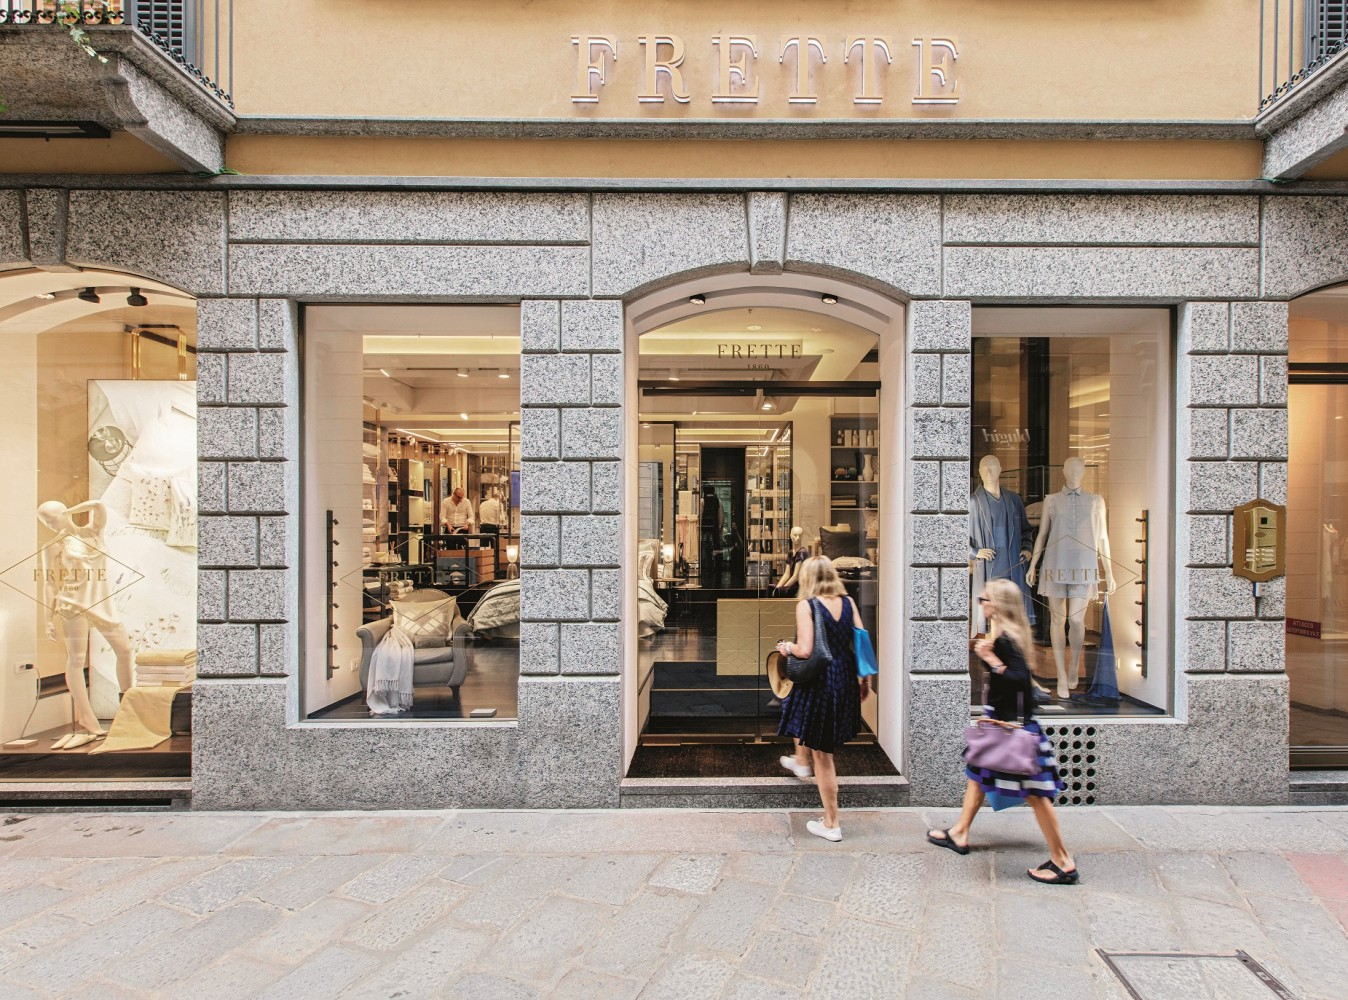 Frette's flagship store